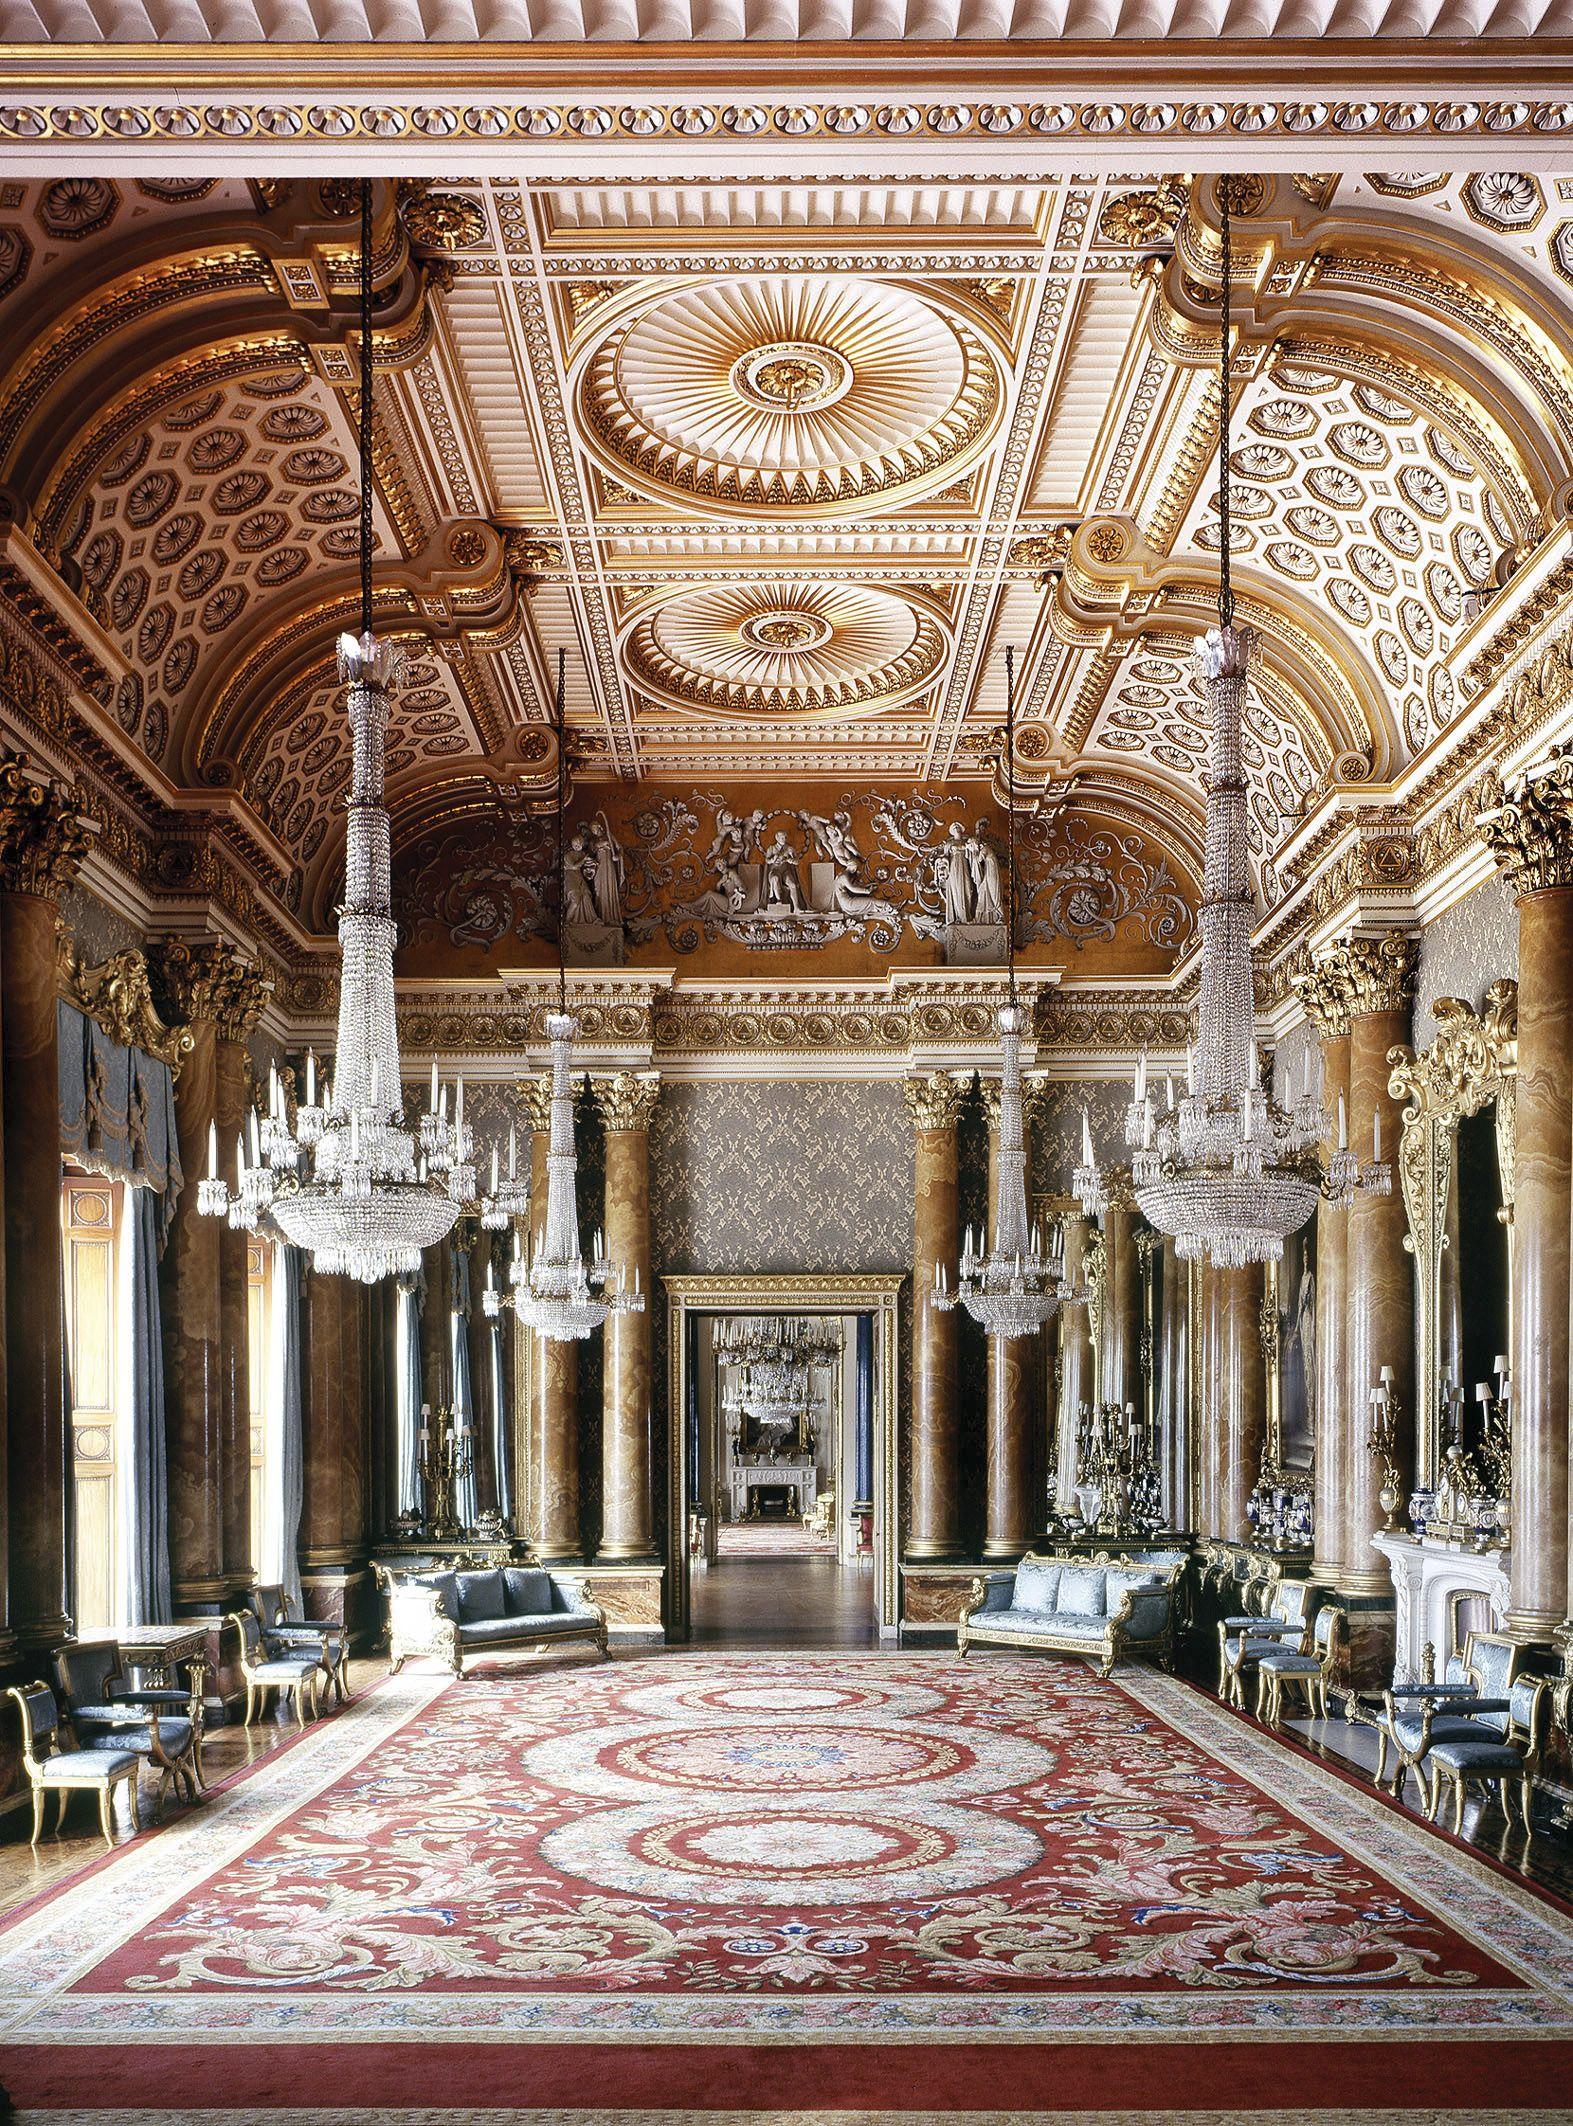 Throne room buckingham palace - Buckingham Palace Interior